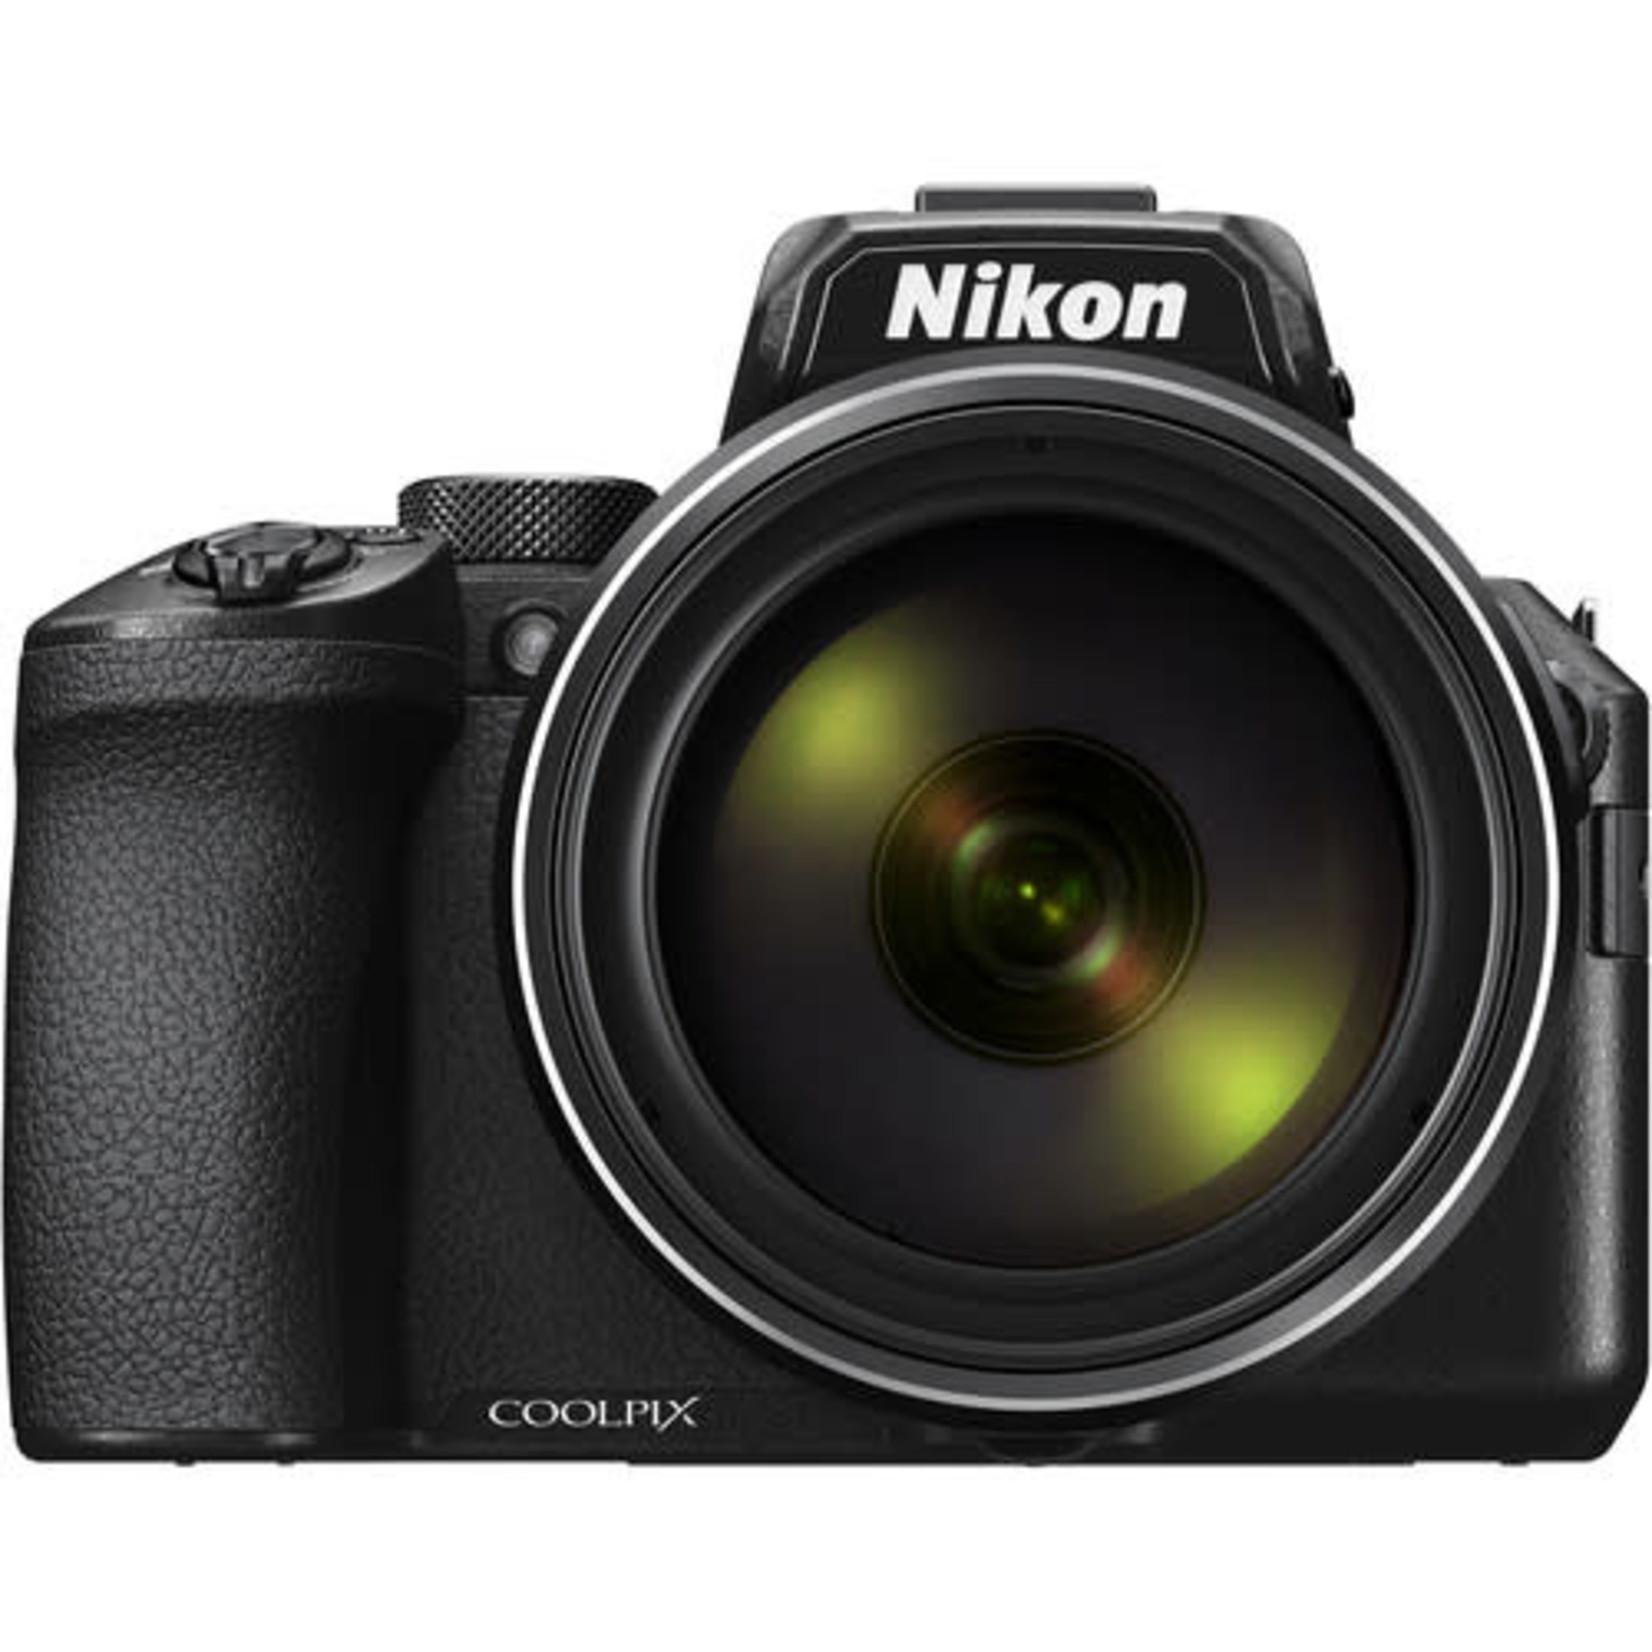 Nikon Nikon COOLPIX P950 Digital Camera